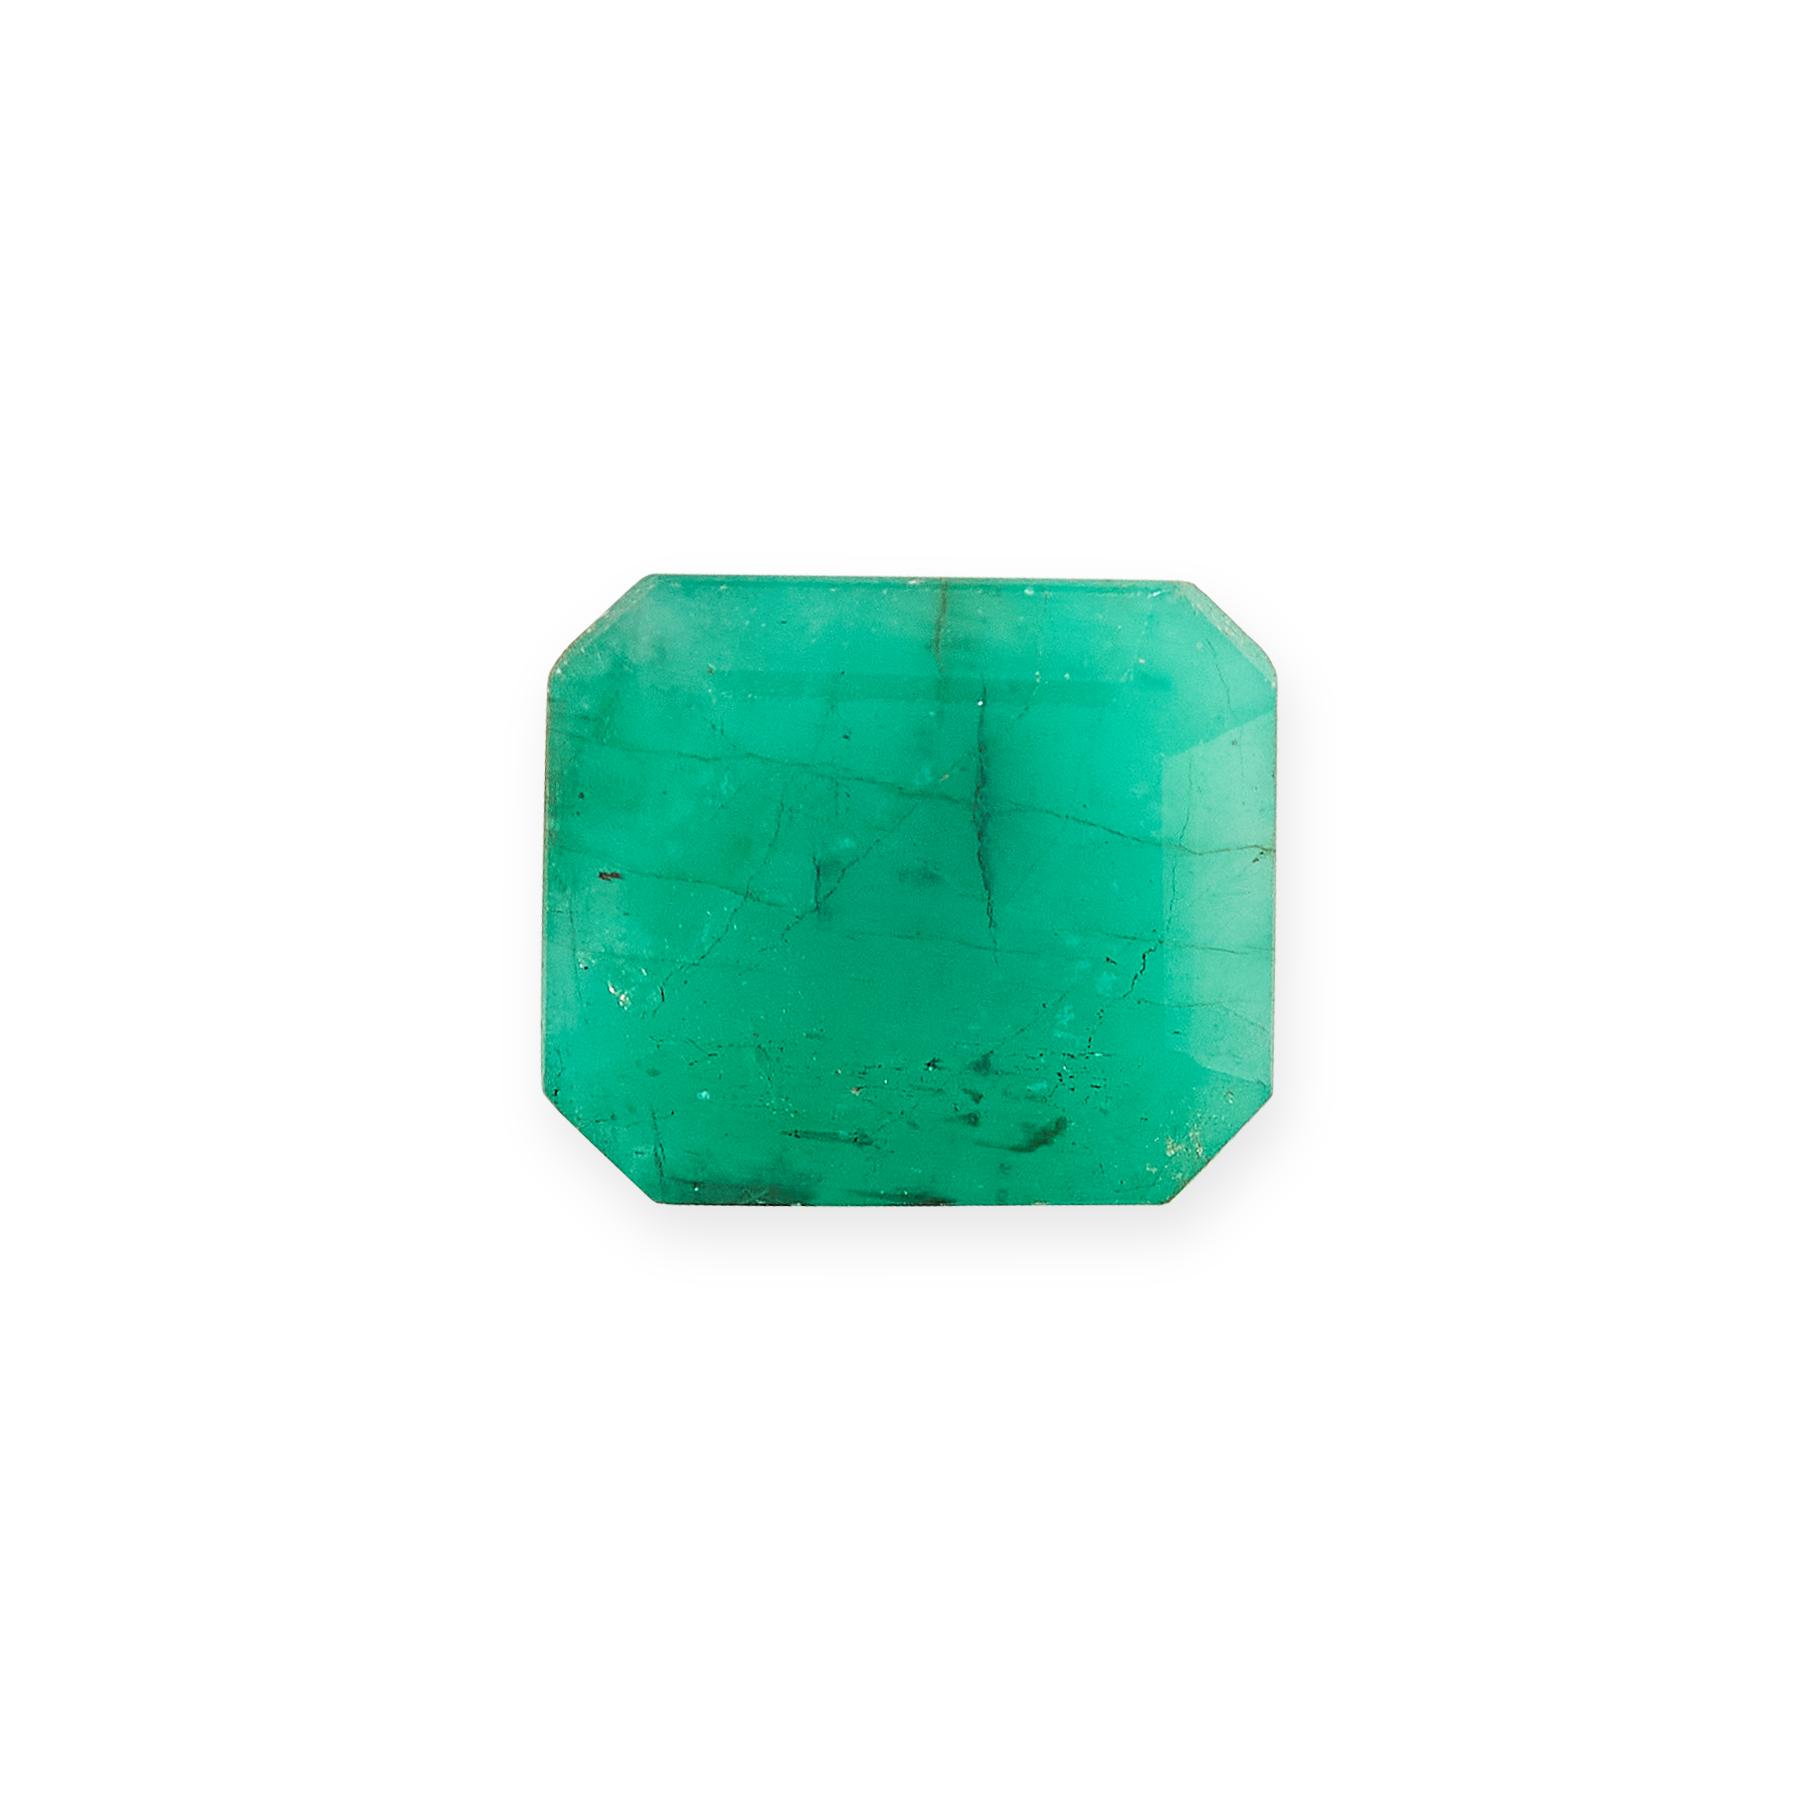 UNMOUNTED EMERALD of 2.85 carats, emerald cut.